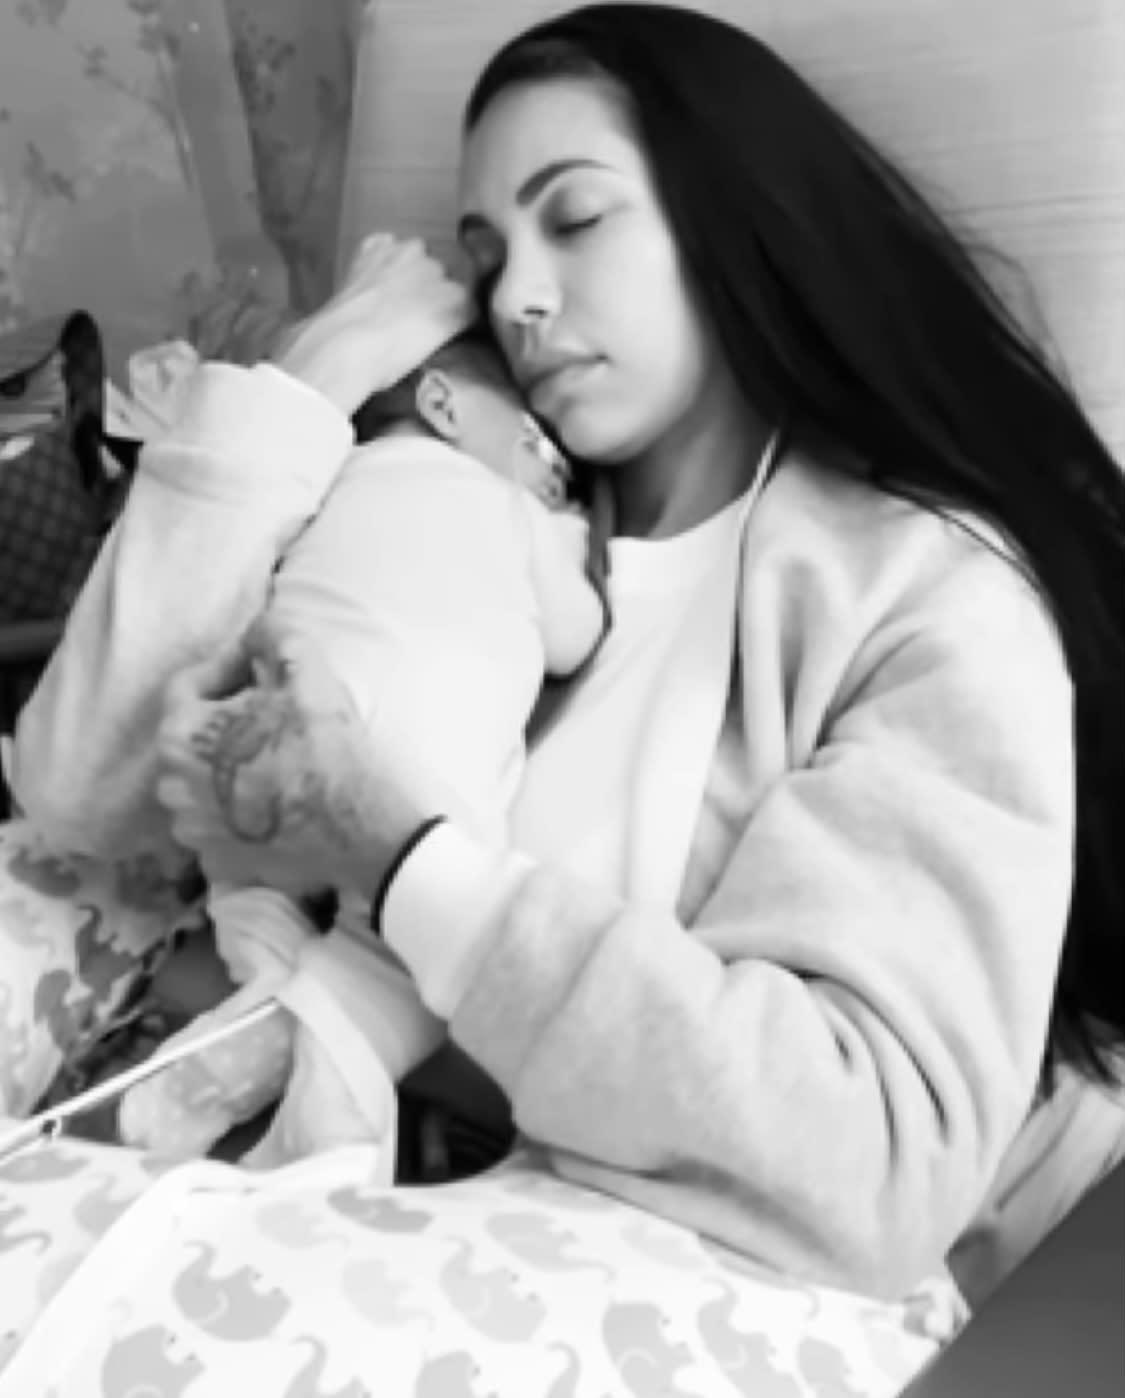 Safaree Samuels and Erica Mena's newborn son in intensive care